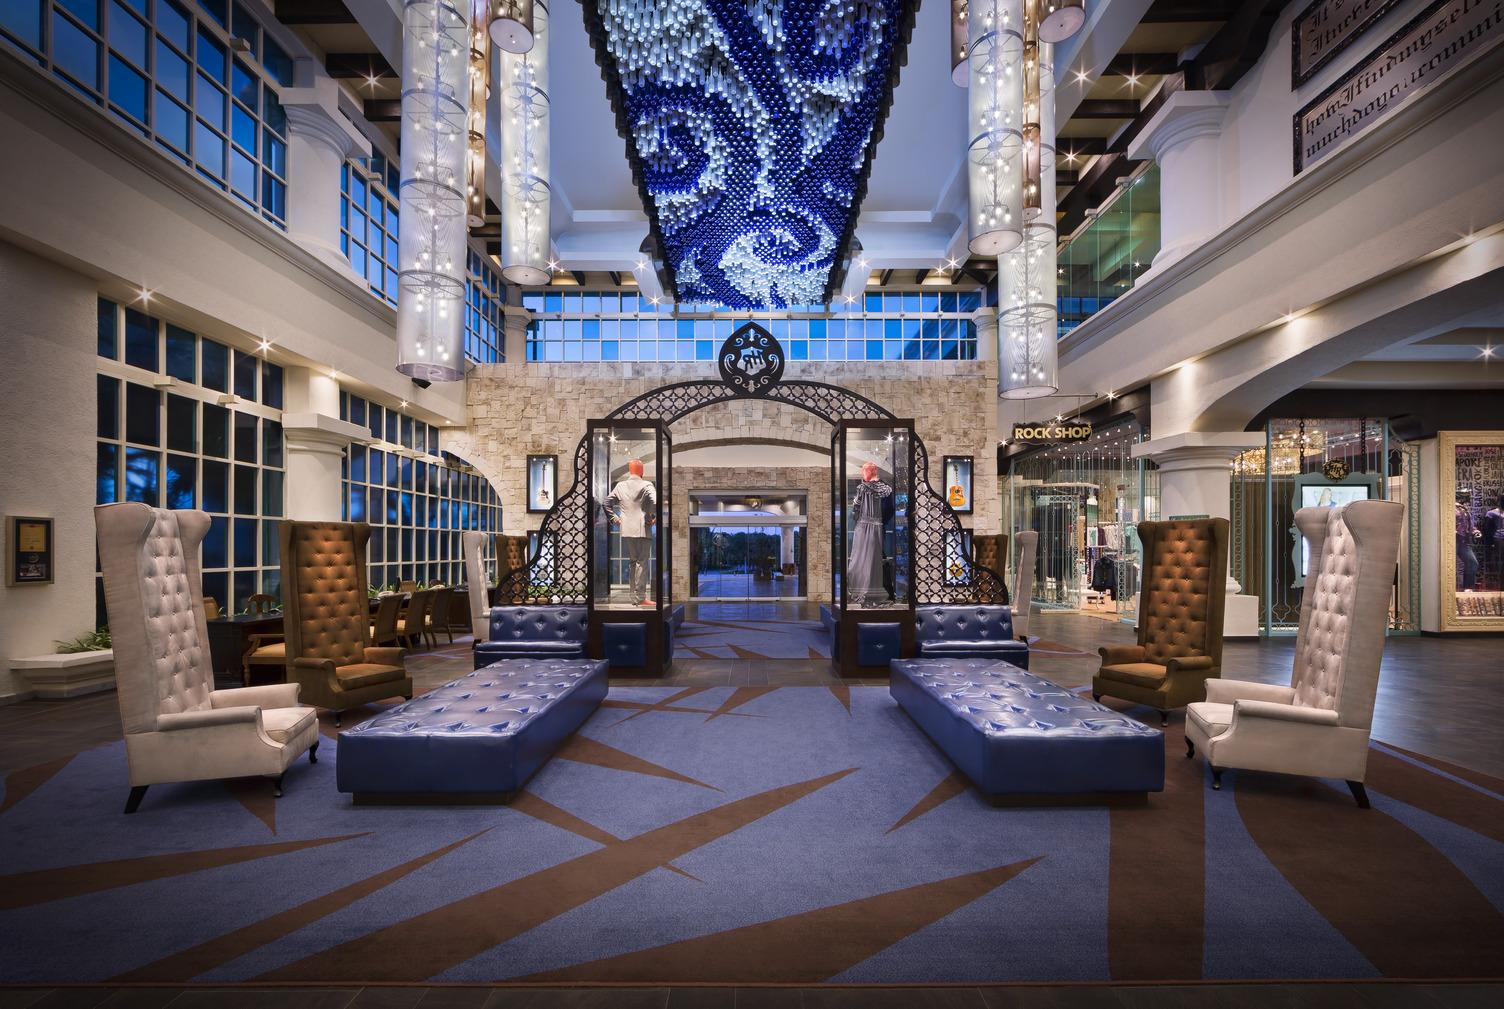 Travel Agency All-Inclusive Resort Heaven at Hard Rock Hotel Riviera Maya 22